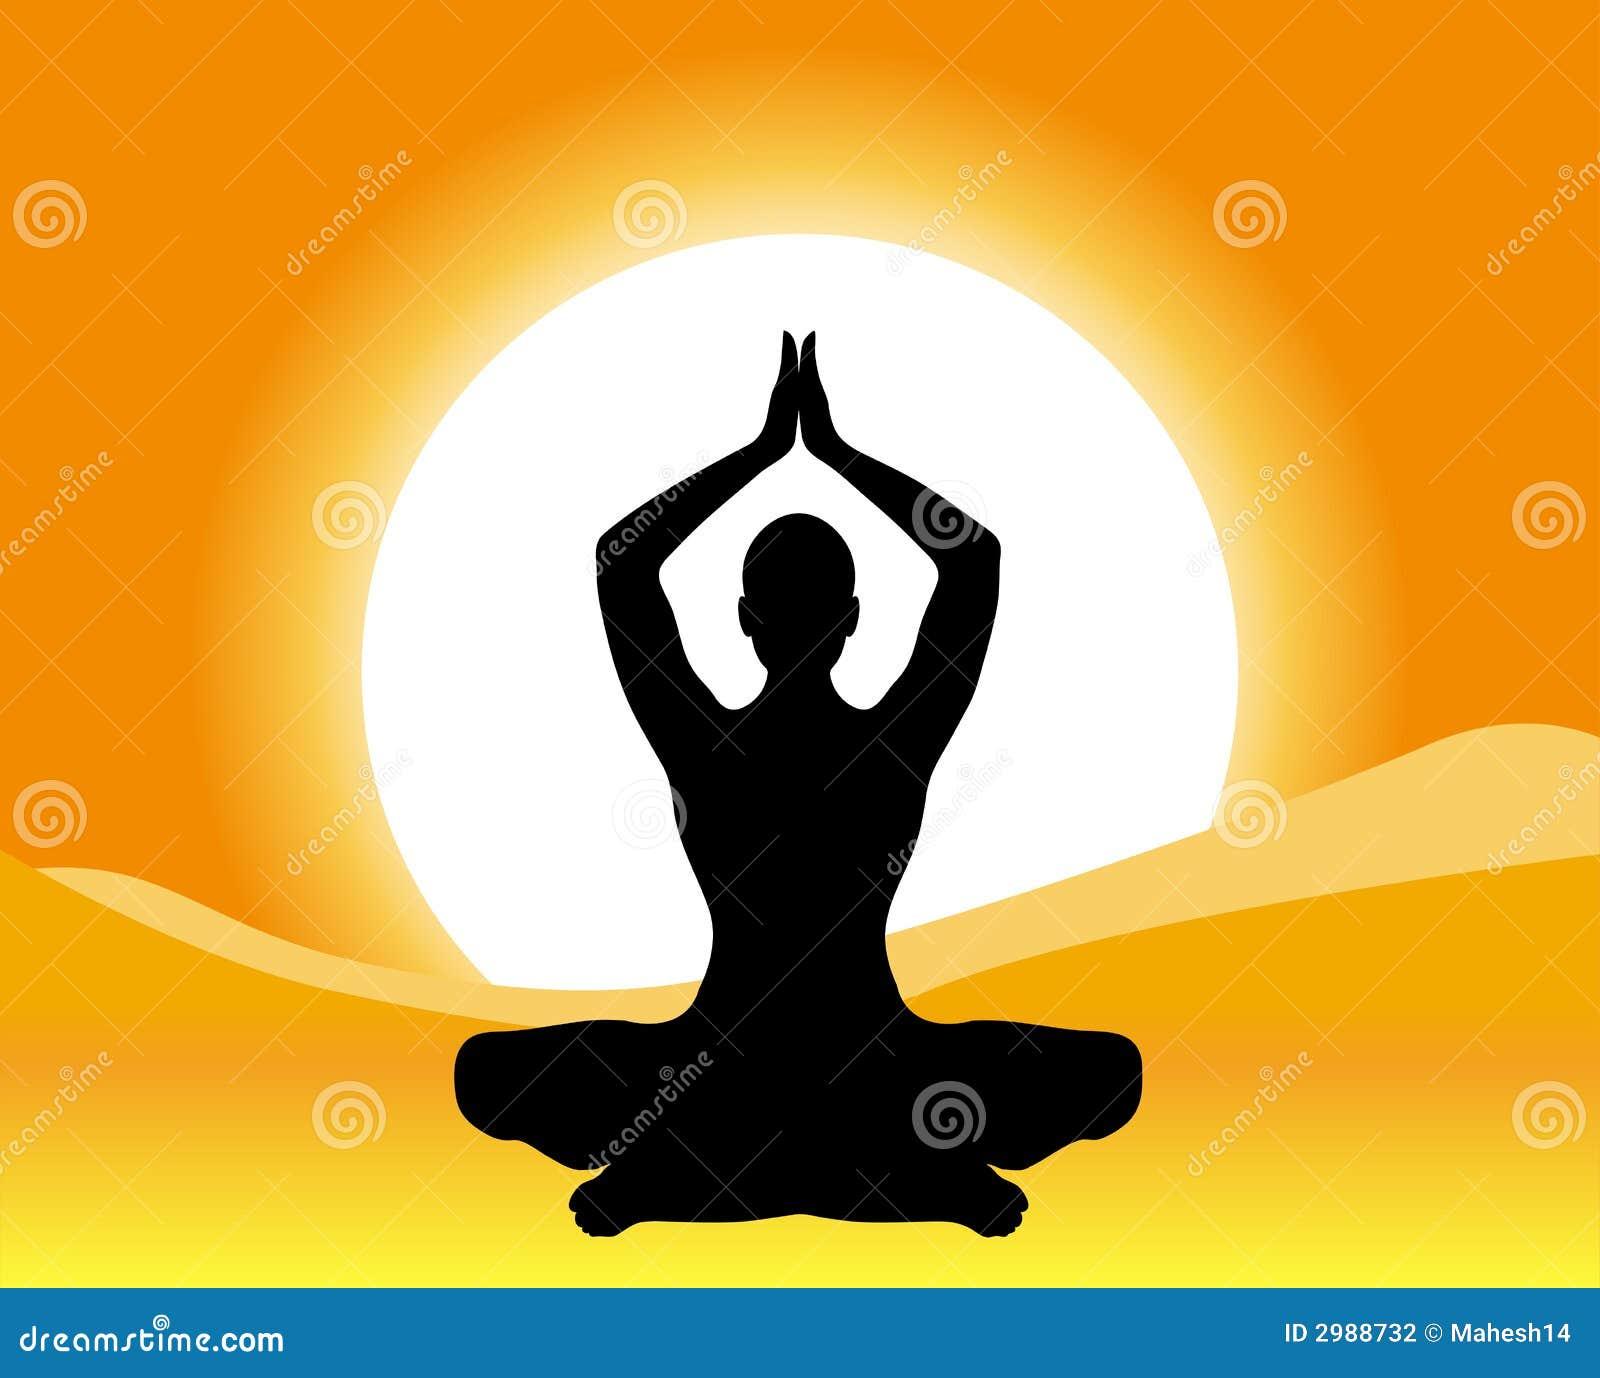 Silhouette Illustration Of Yoga